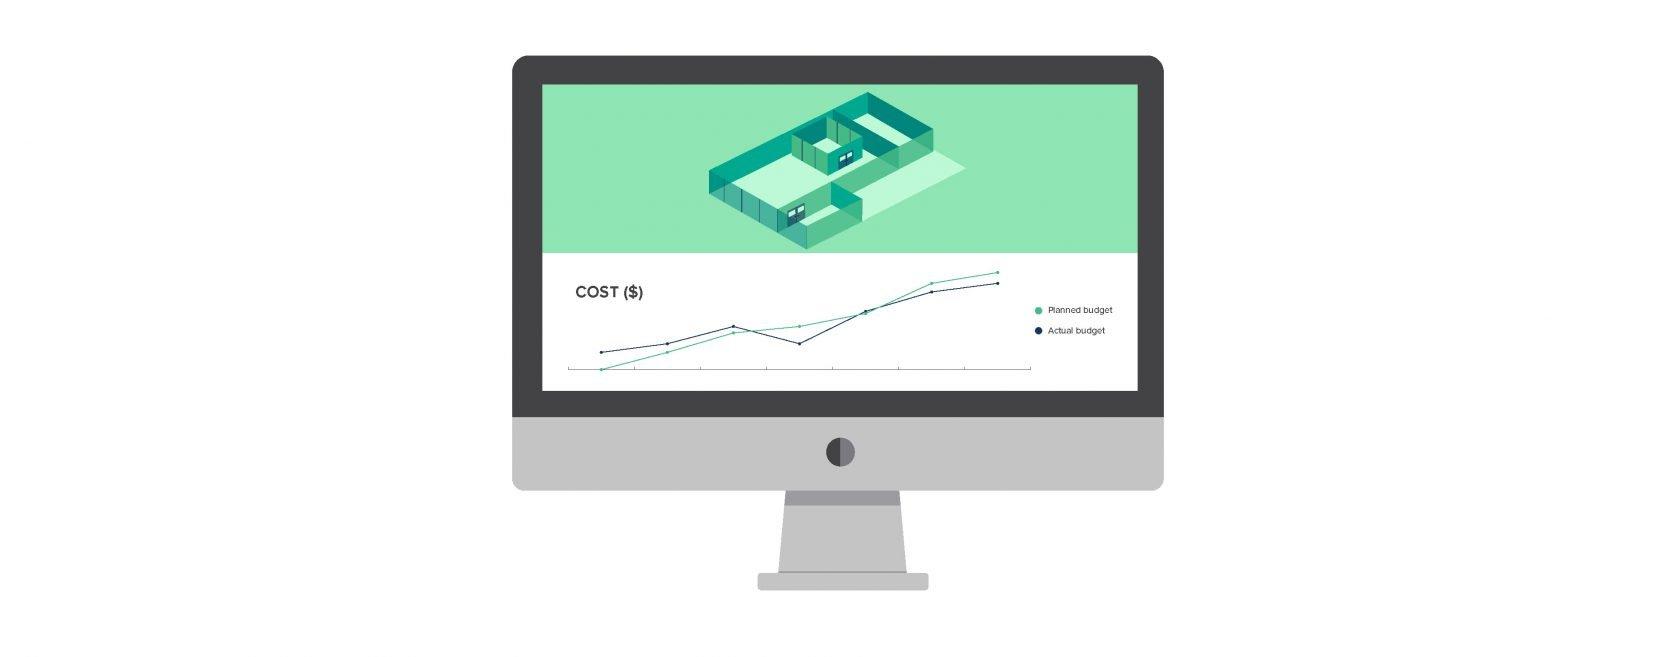 BIM VDC Cost Estimating